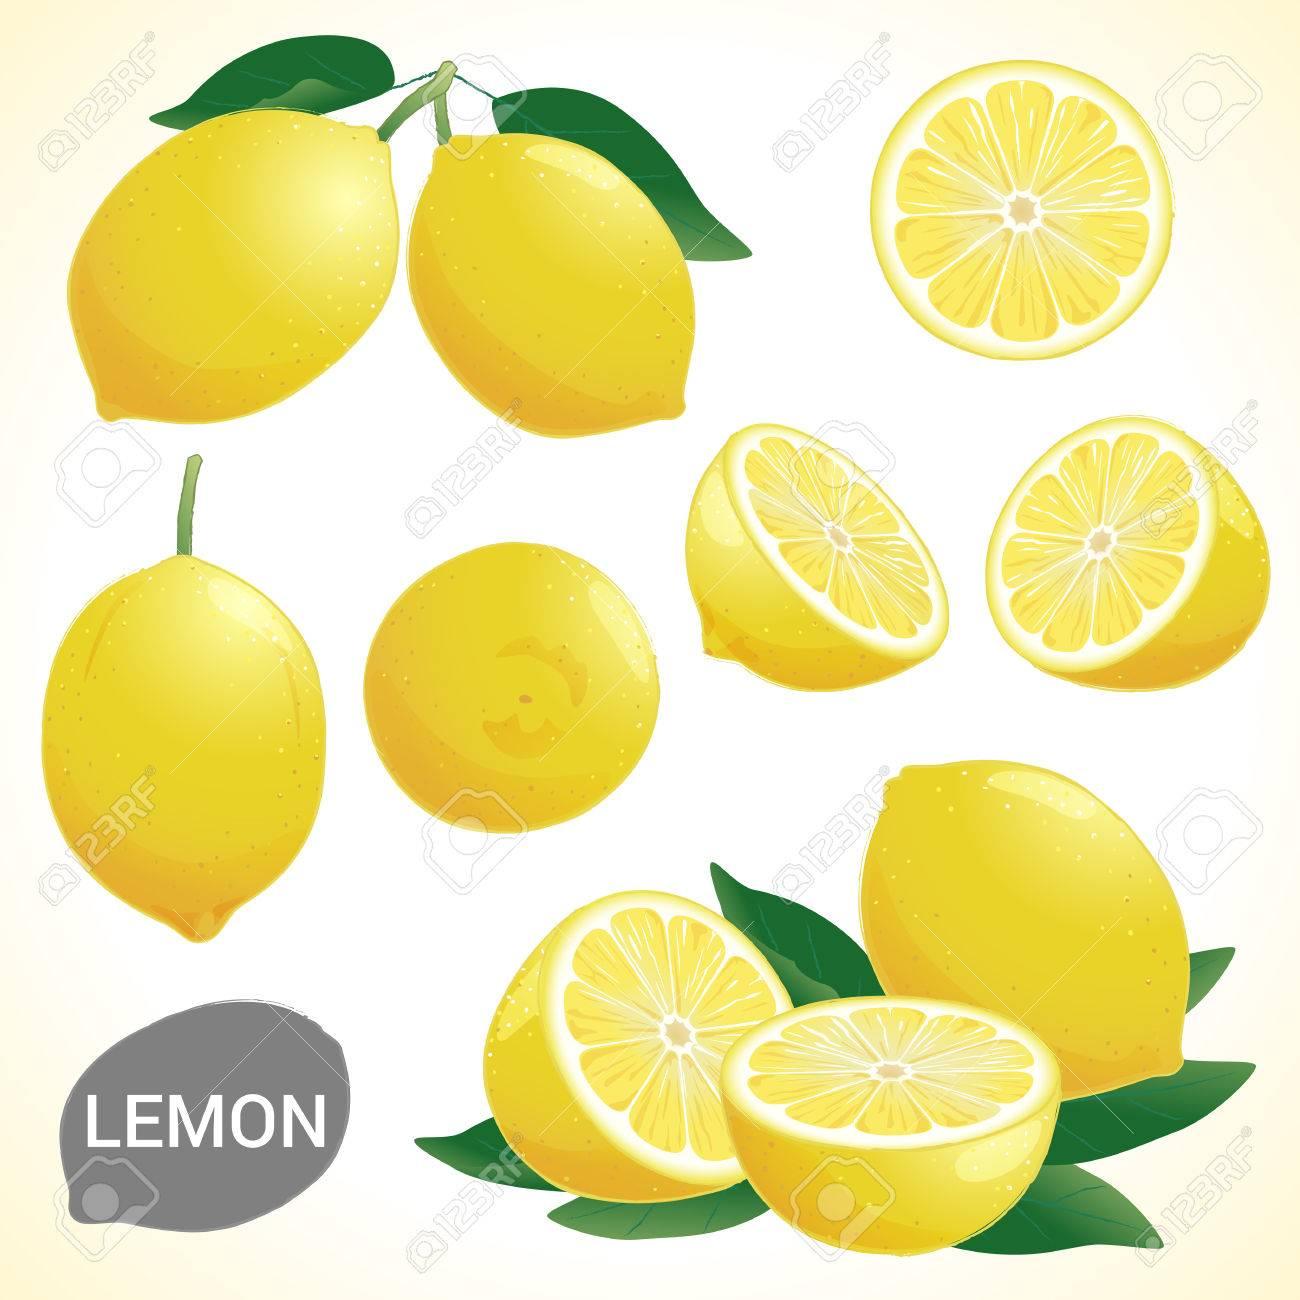 Set of fresh yellow lemon in various styles vector format - 44199704